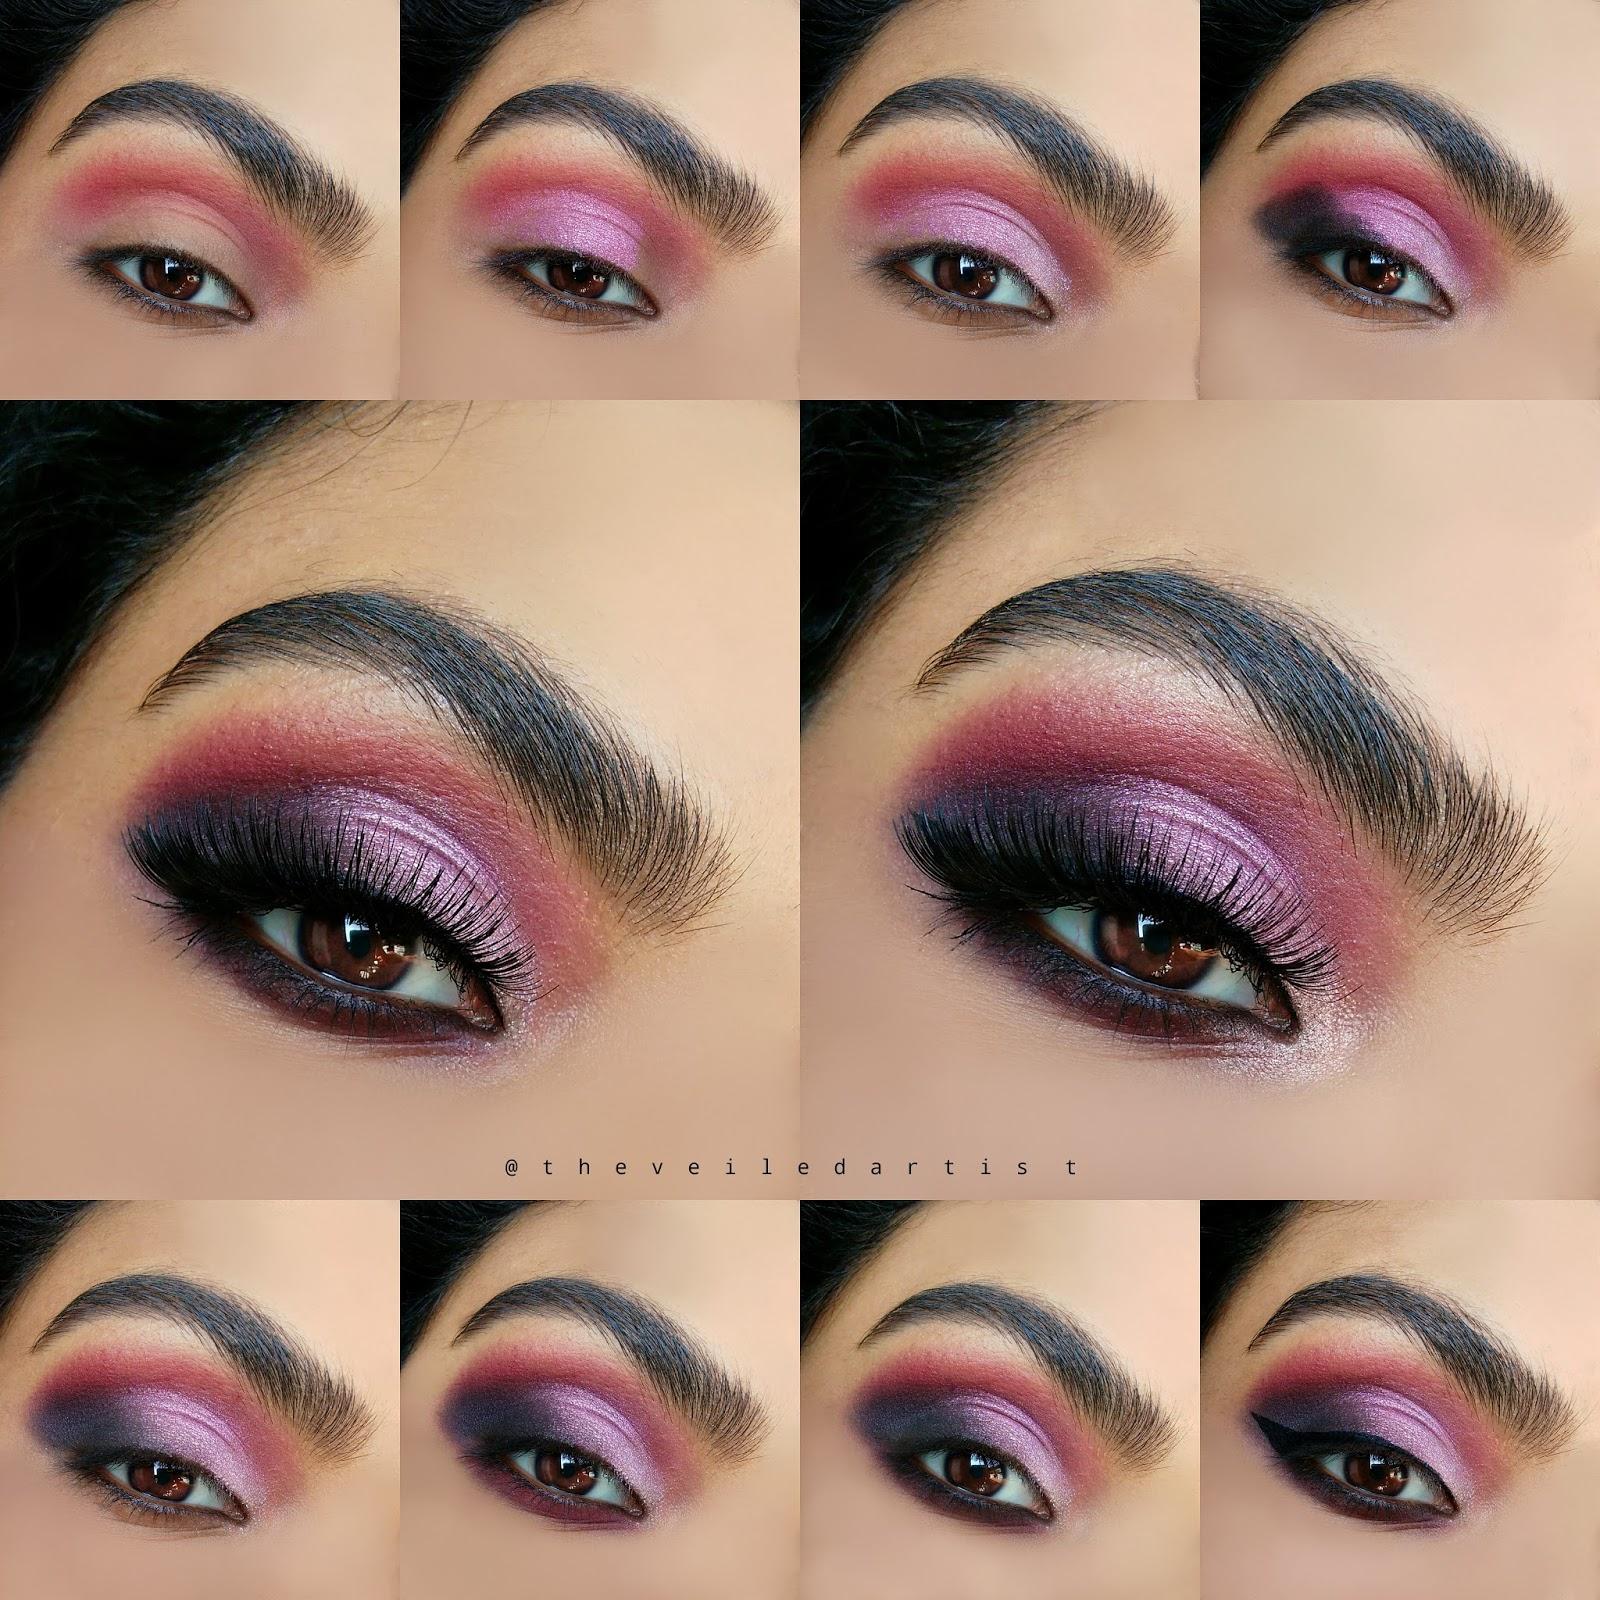 indian bridal makeup inspired eyeshadow tutorial(step by step) - the